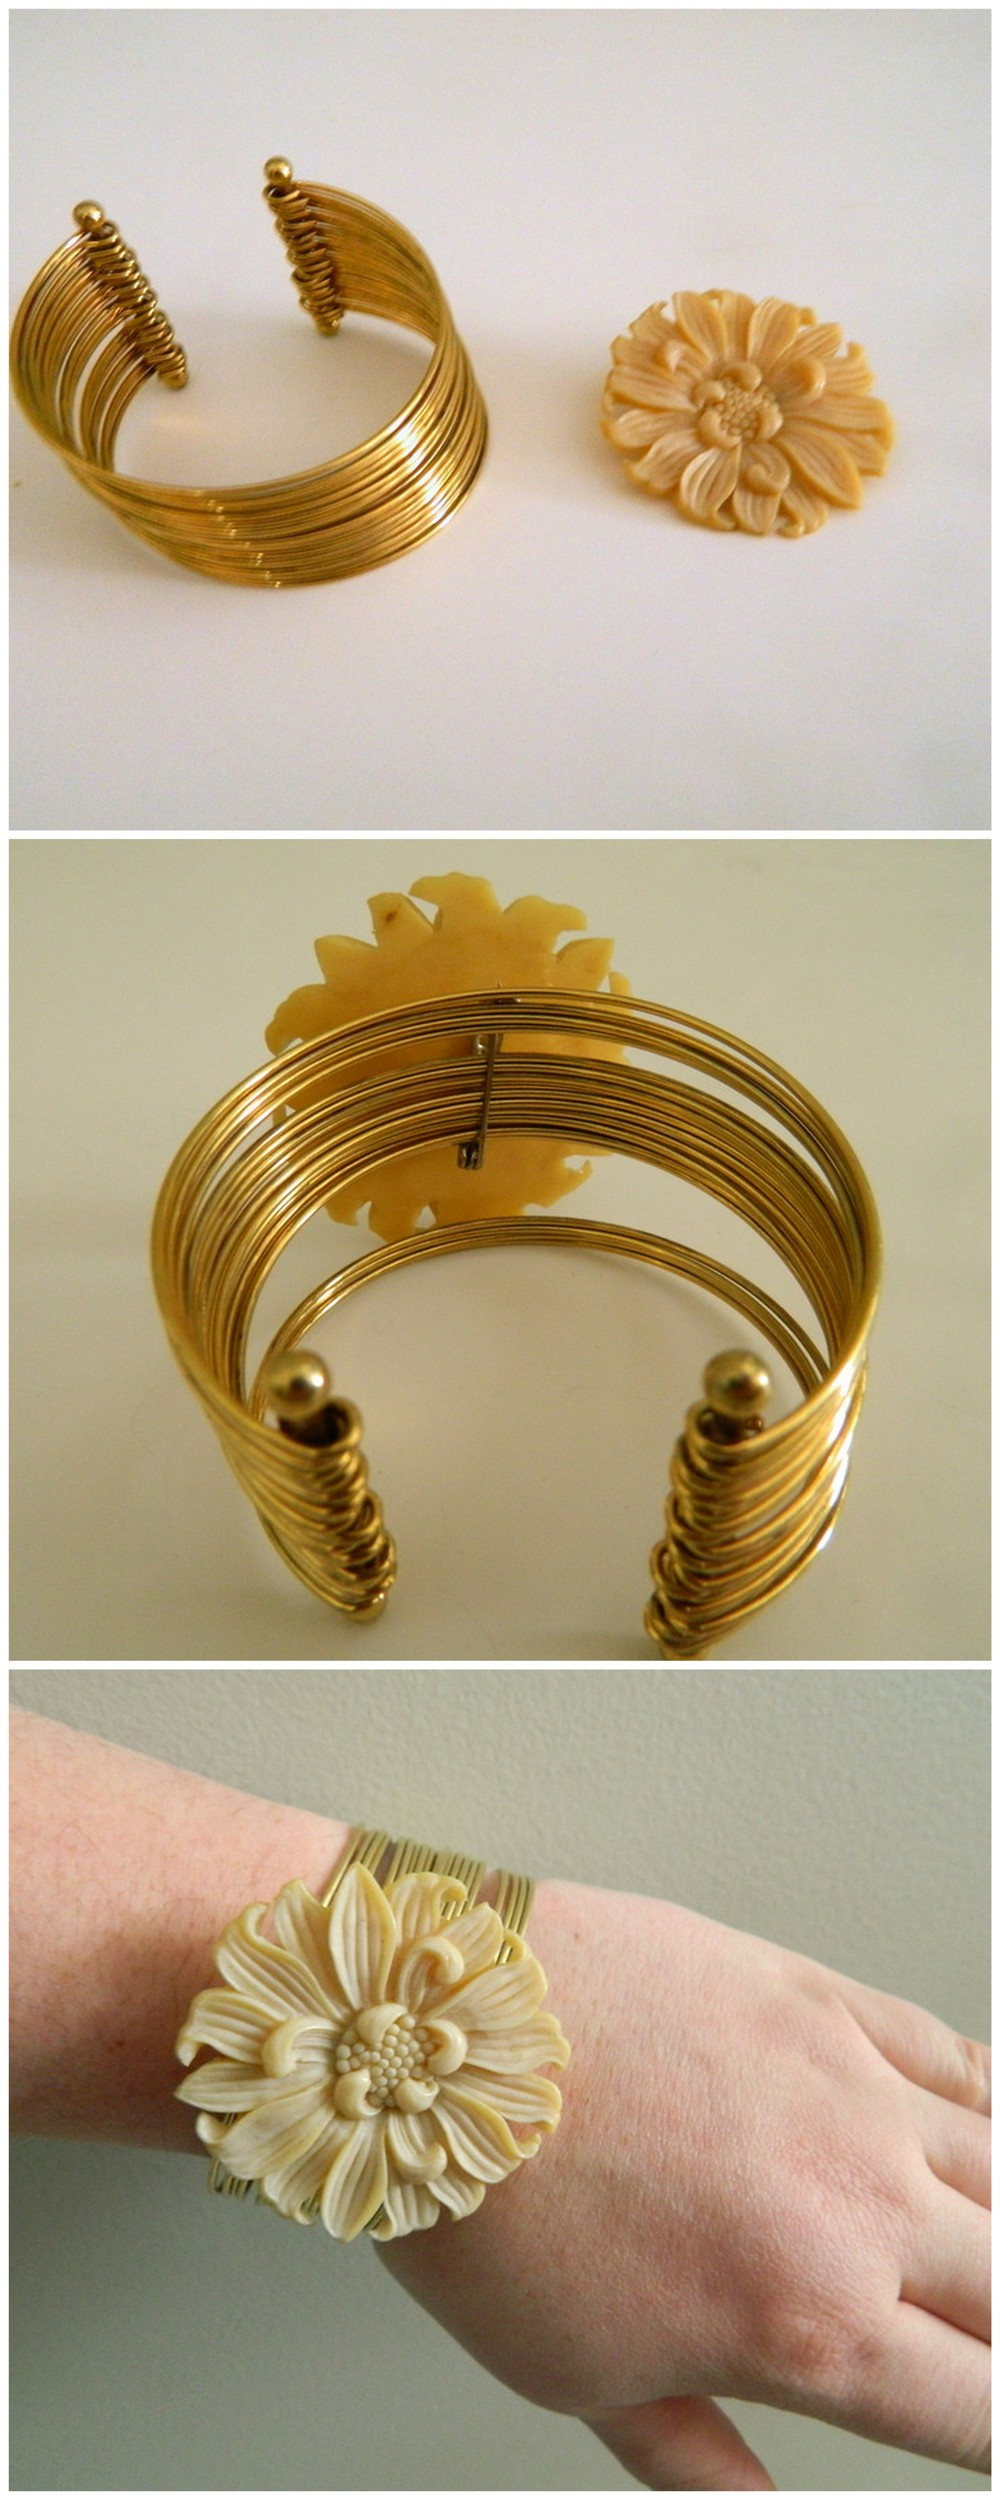 Metal bracelet version